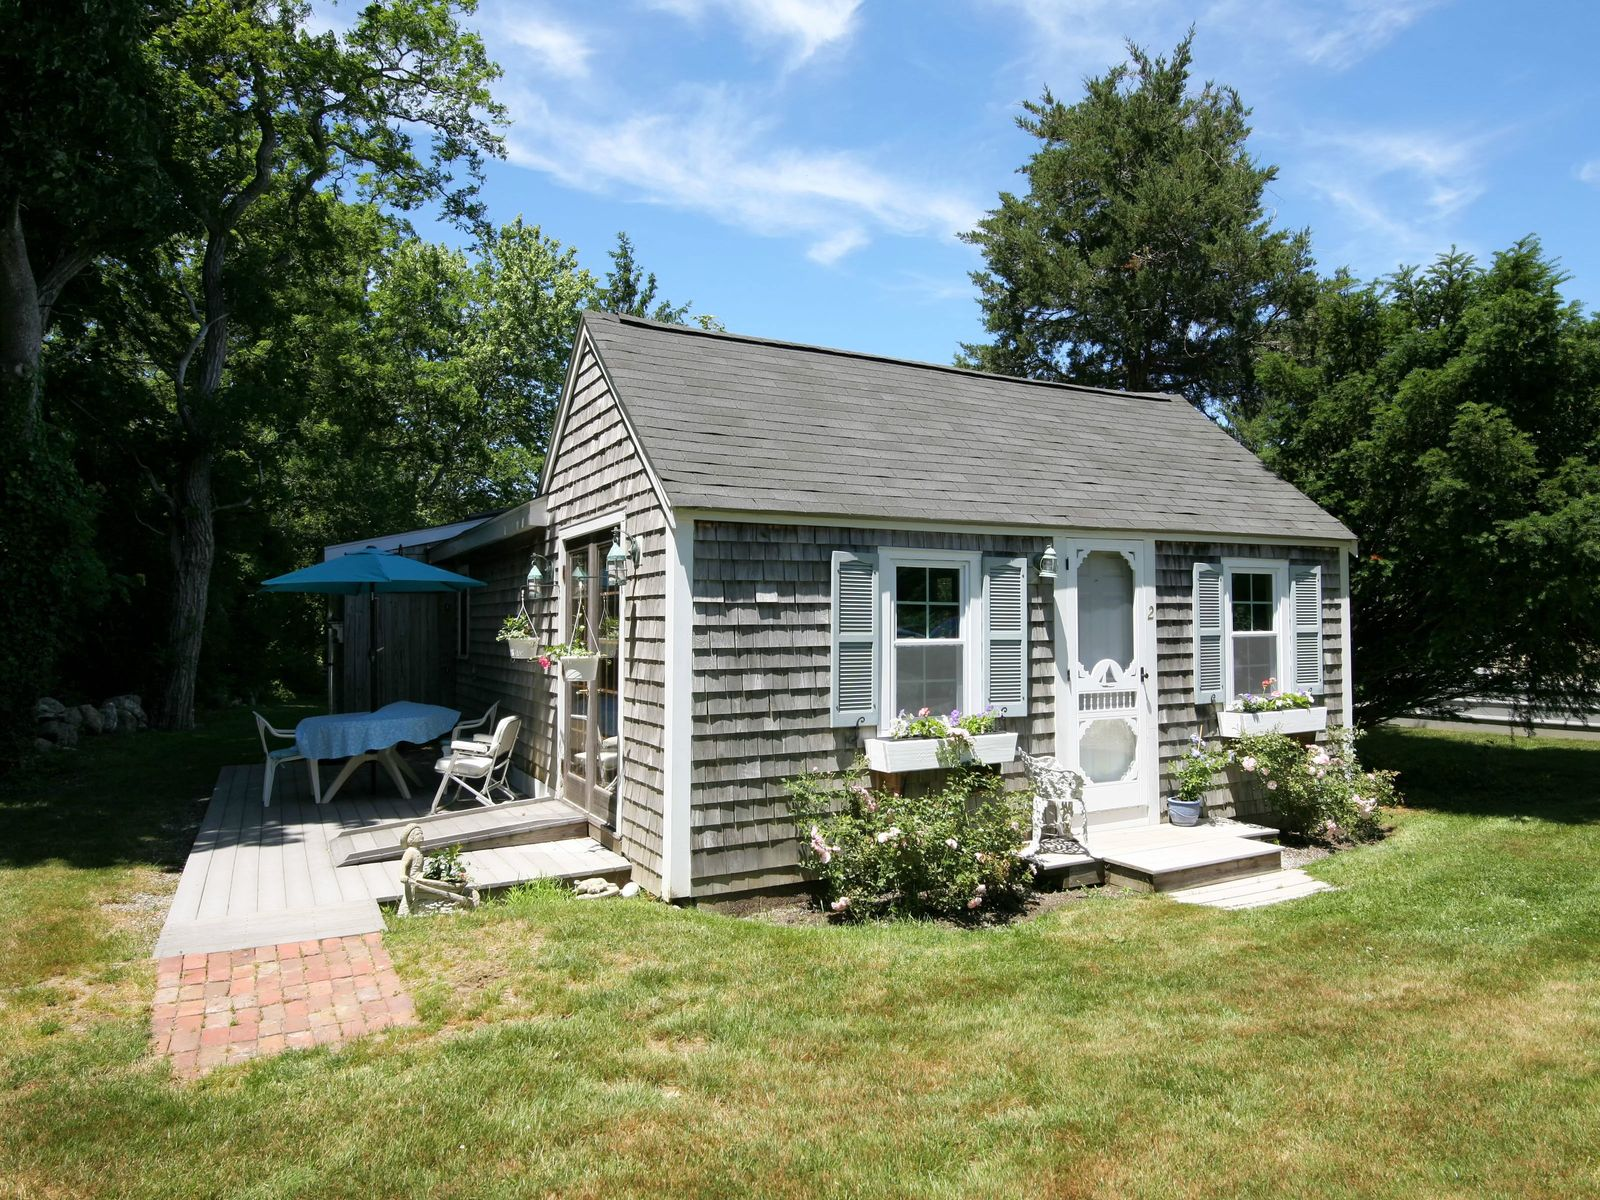 Cape Cod Cottage Getaway